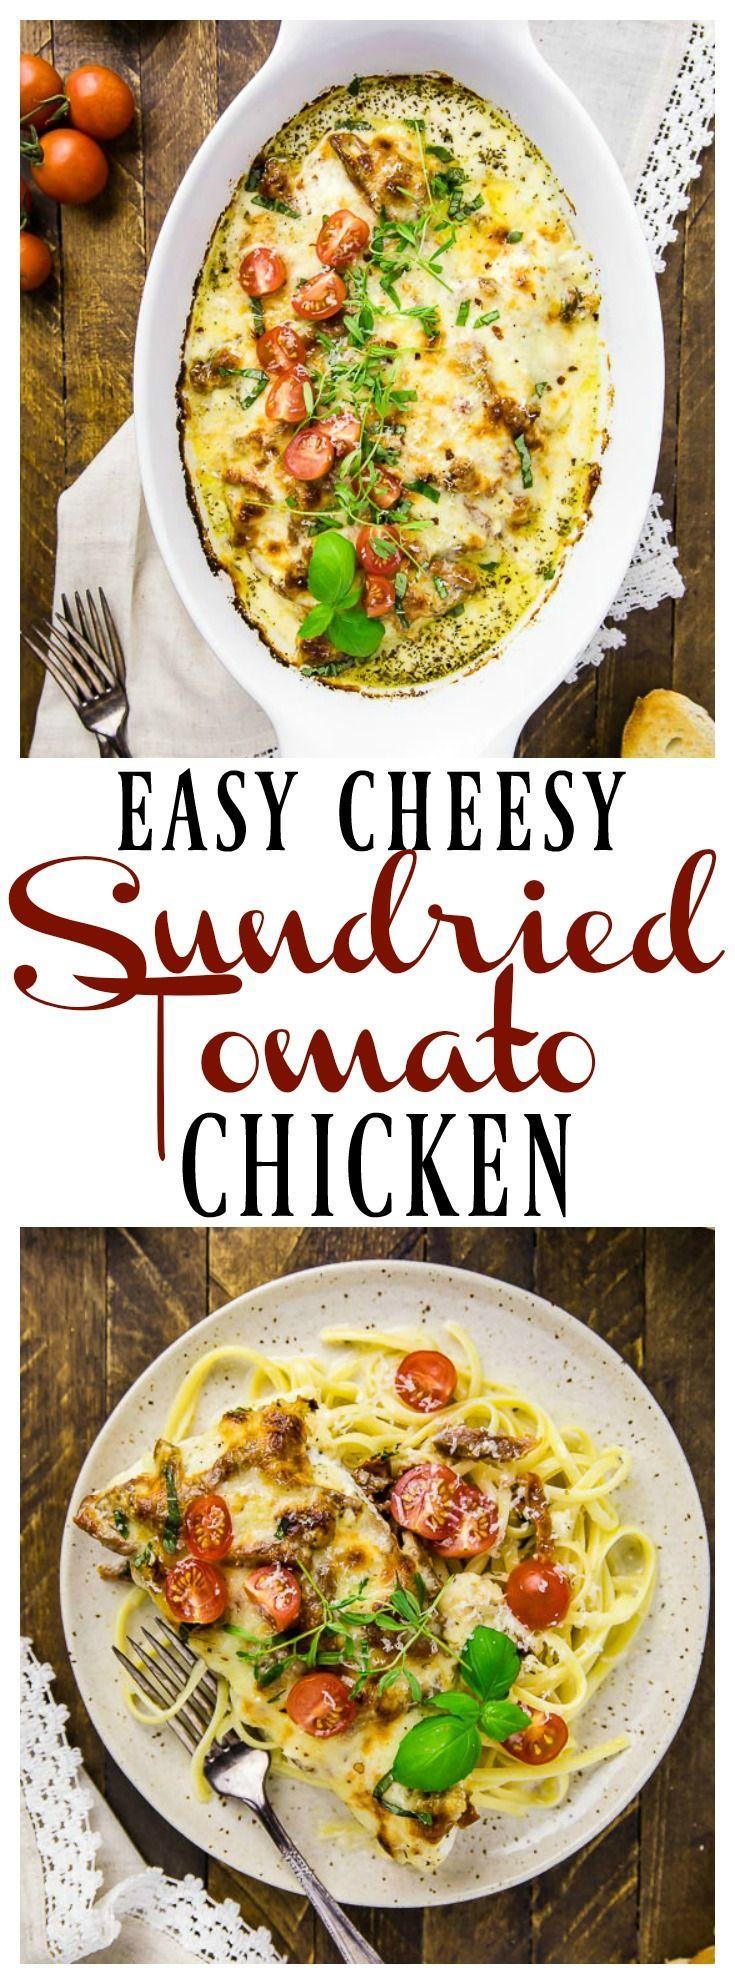 Quick & Easy Cheesy Baked Sundried Tomato Chicken